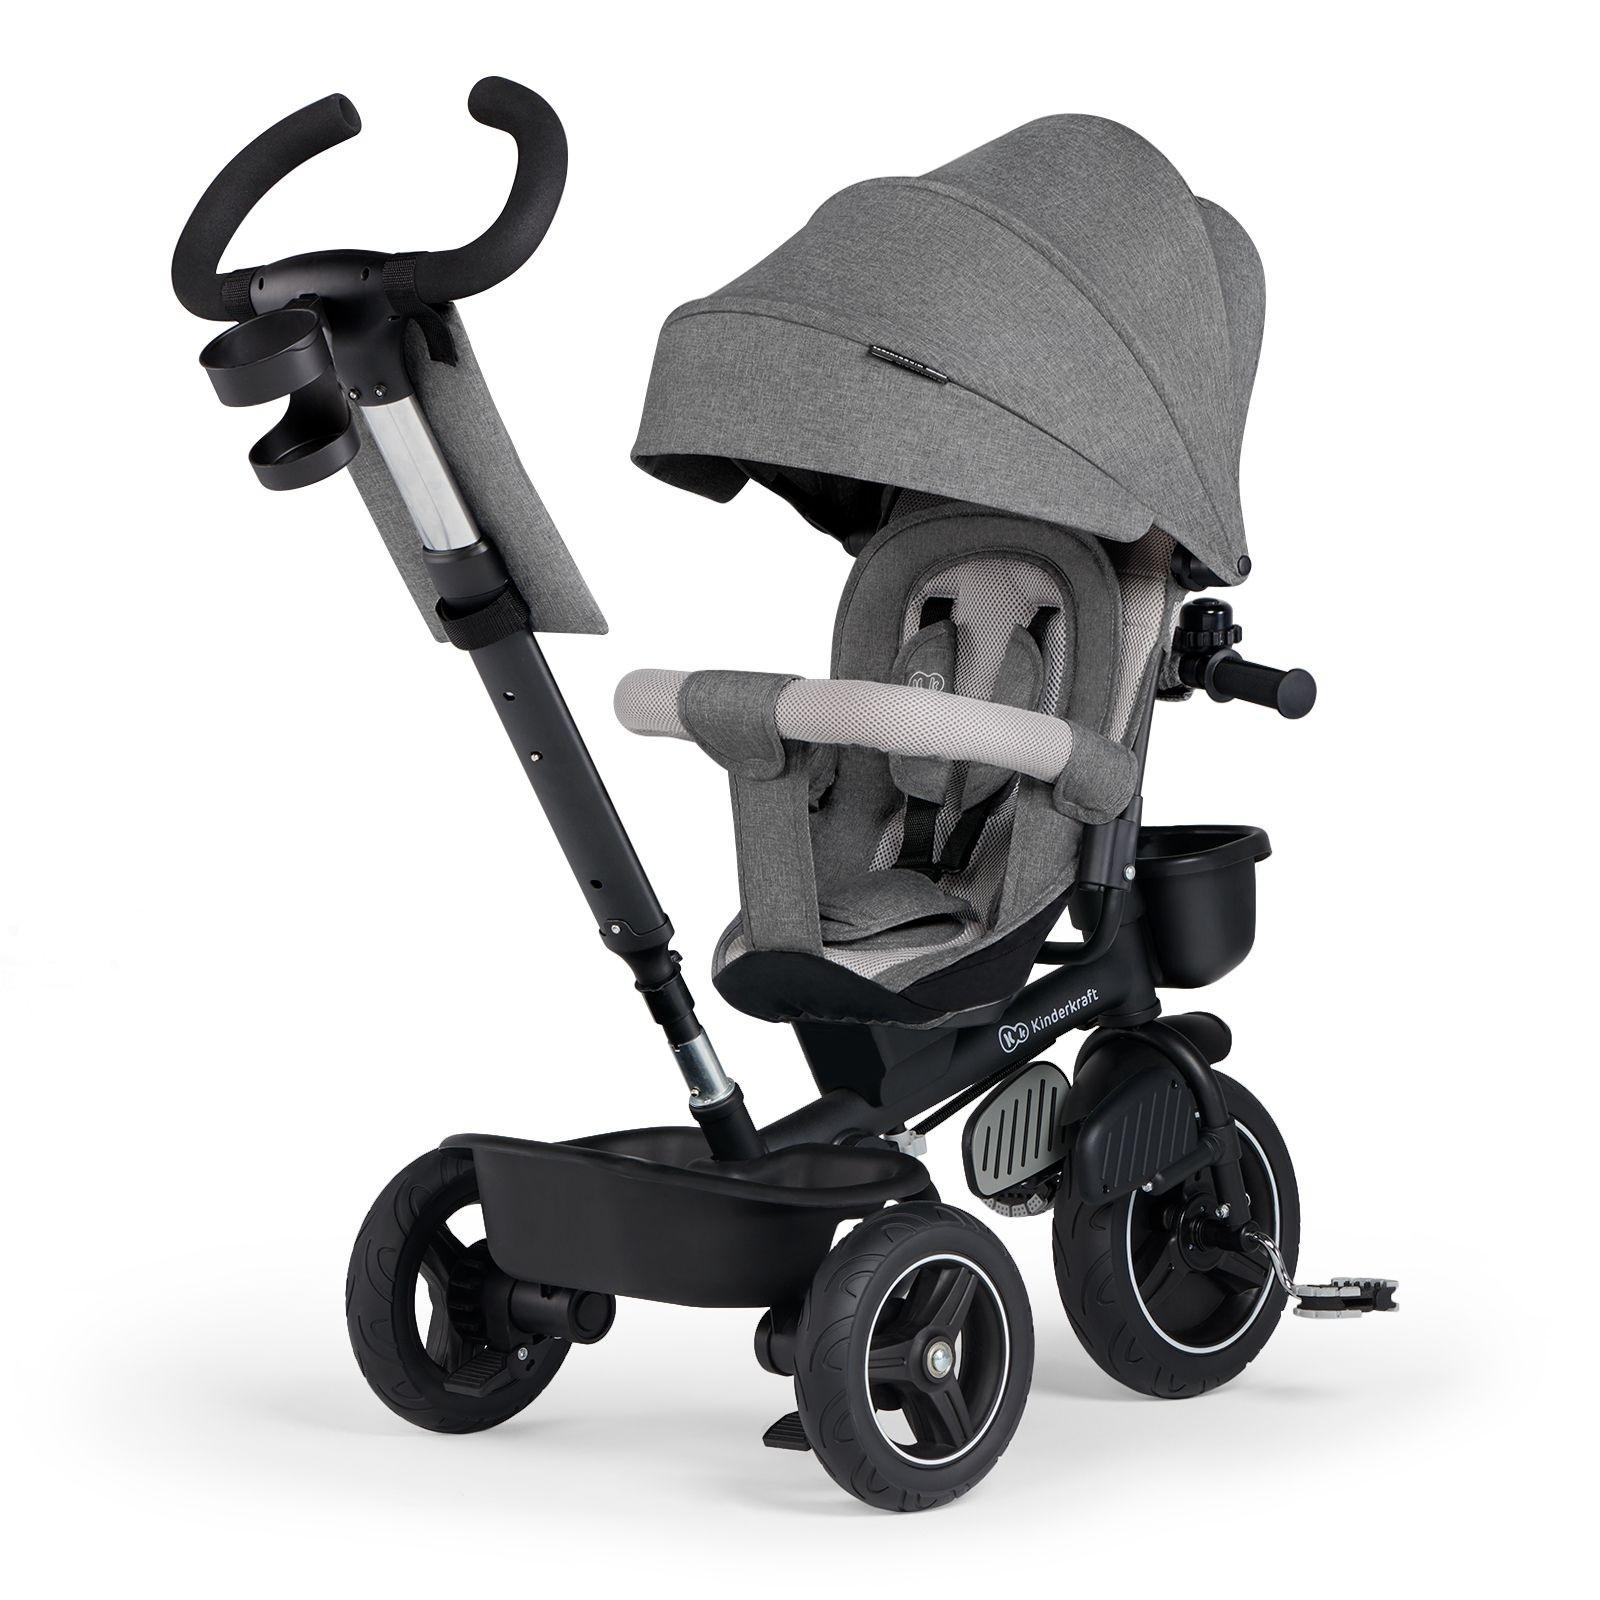 Tricikl guralica Kinderkraft SPINSTEP grey